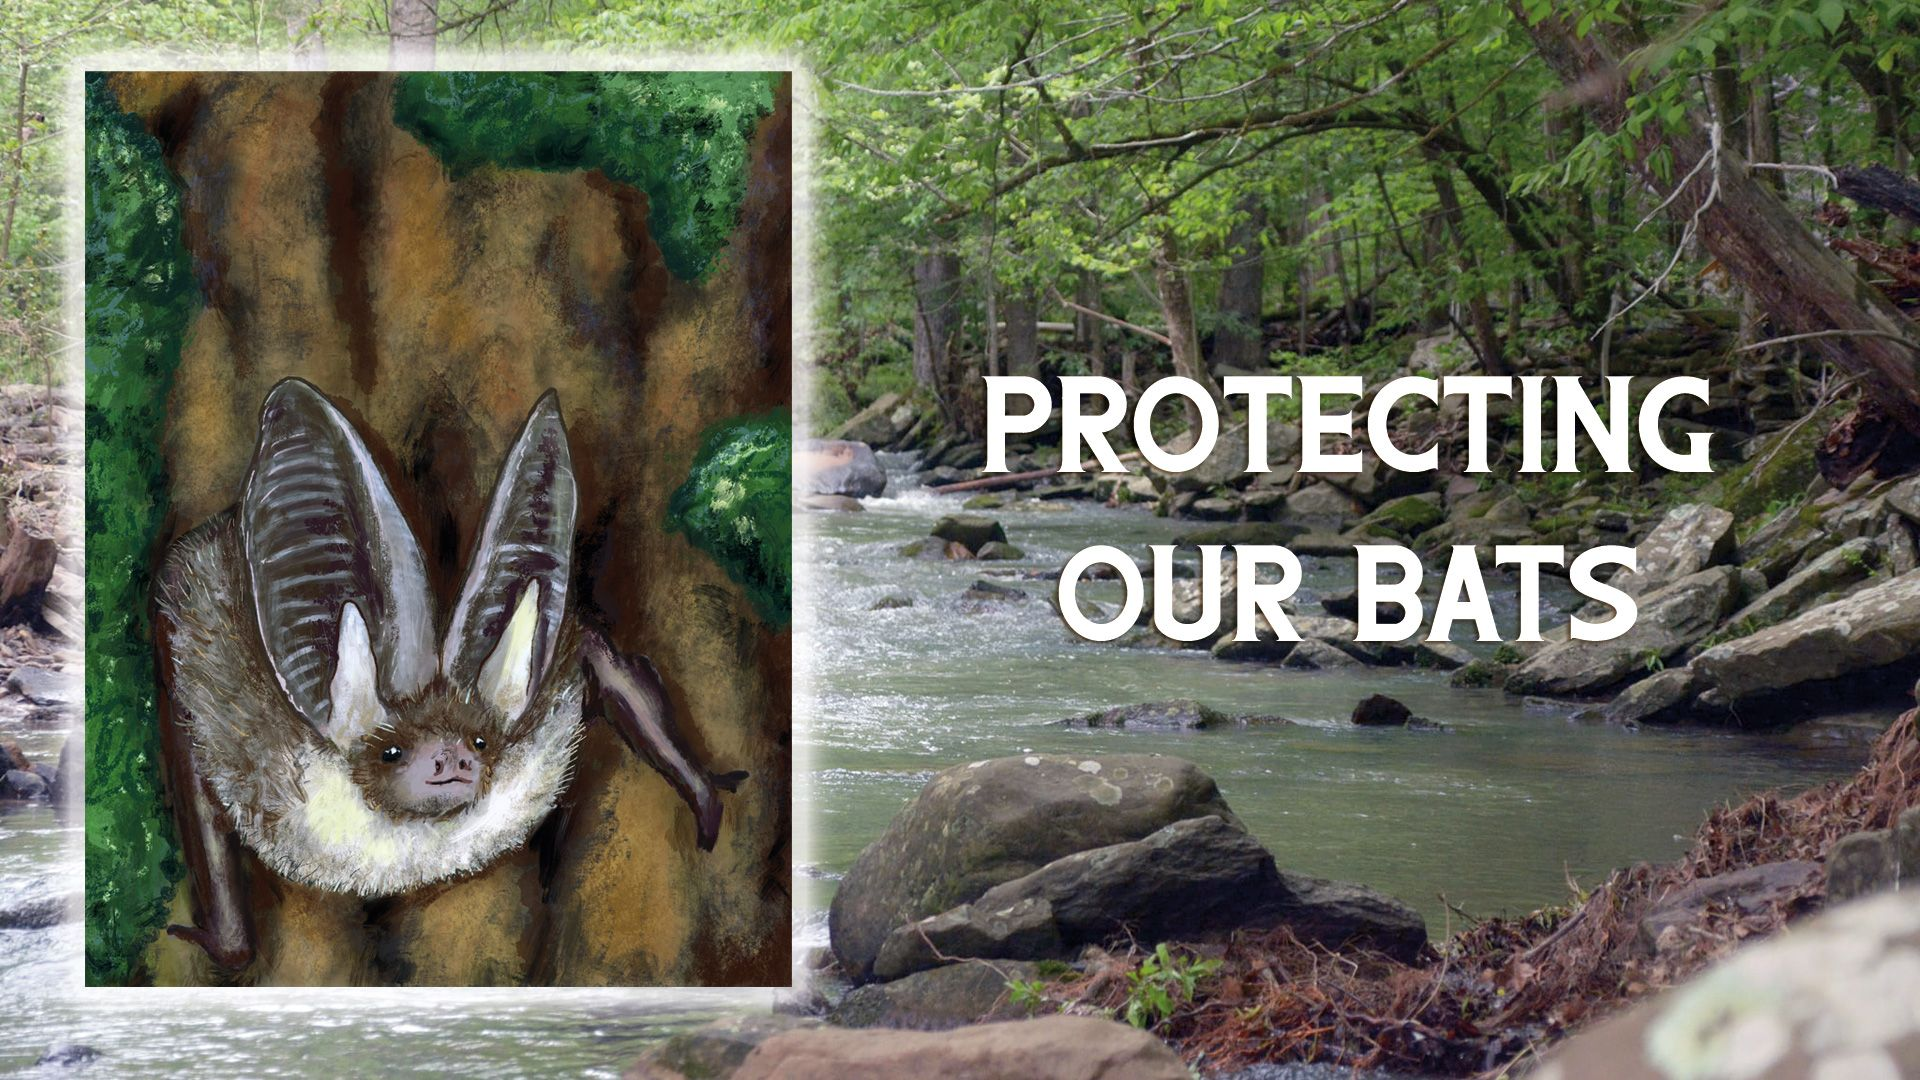 Saving the Ozark Big-Eared Bat